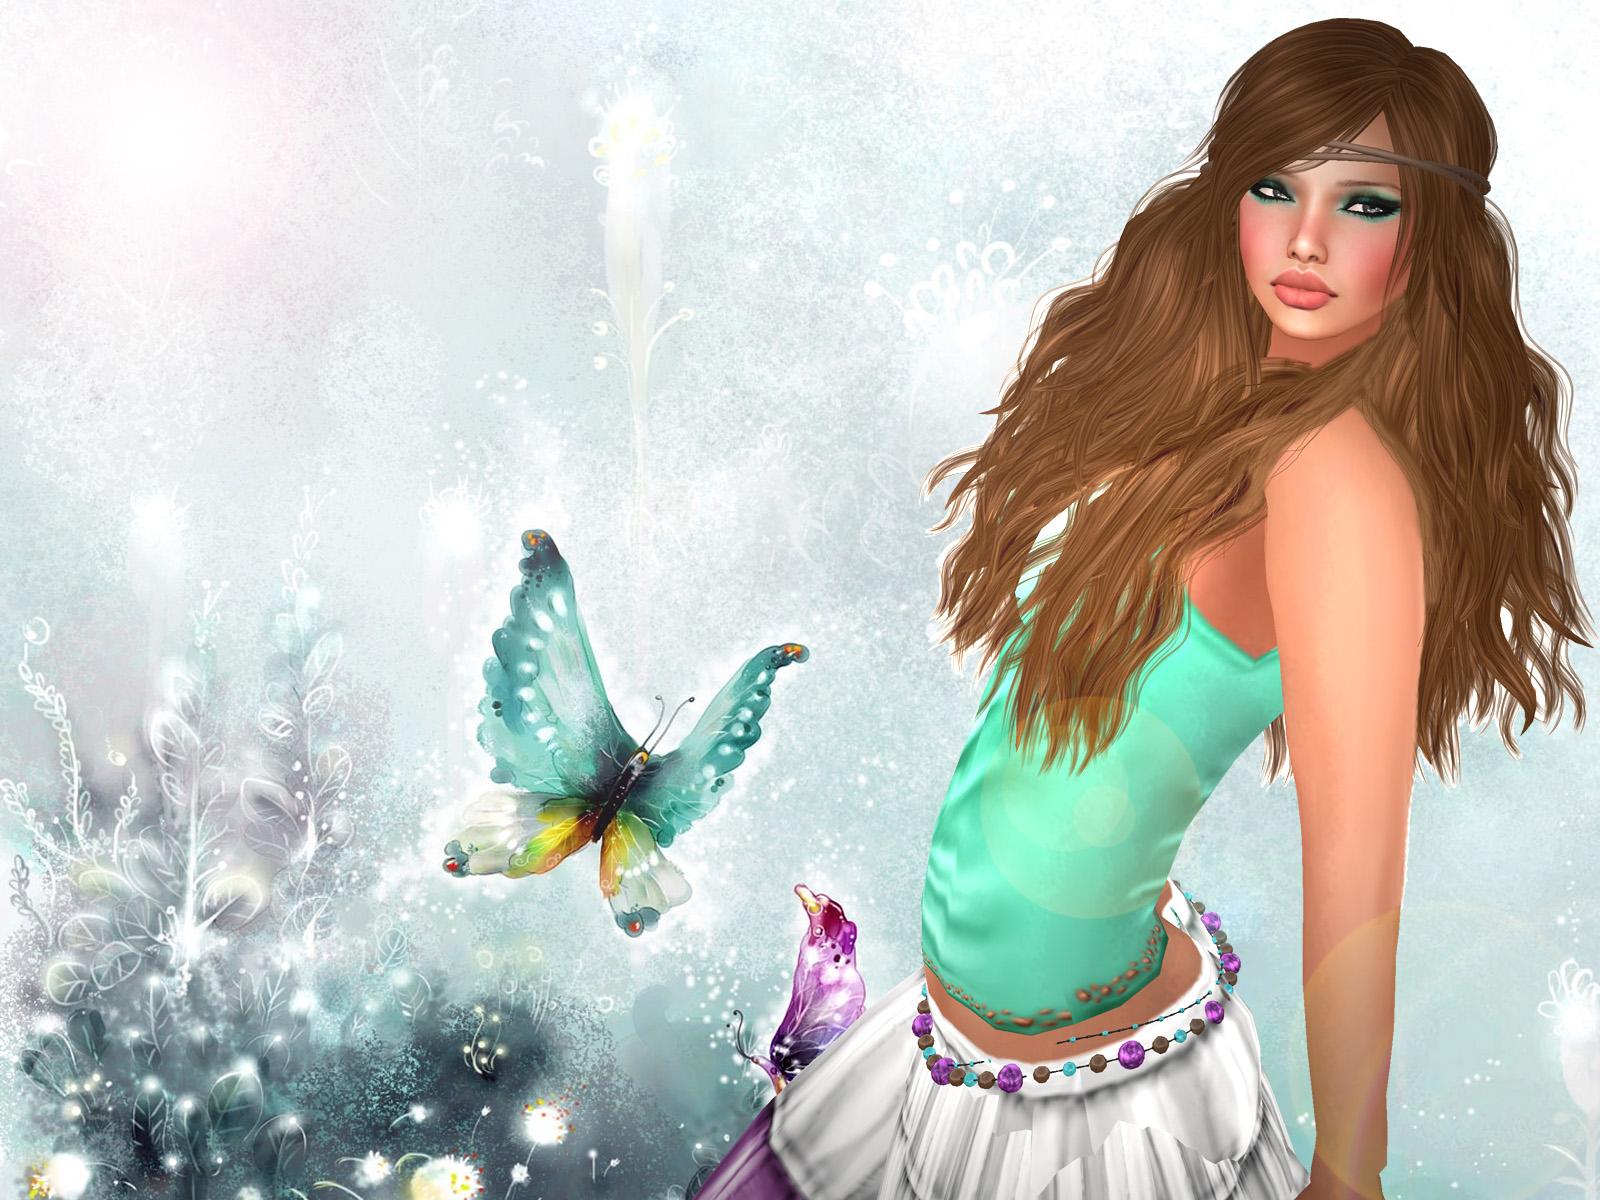 little girl butterfly wallpapers - photo #13